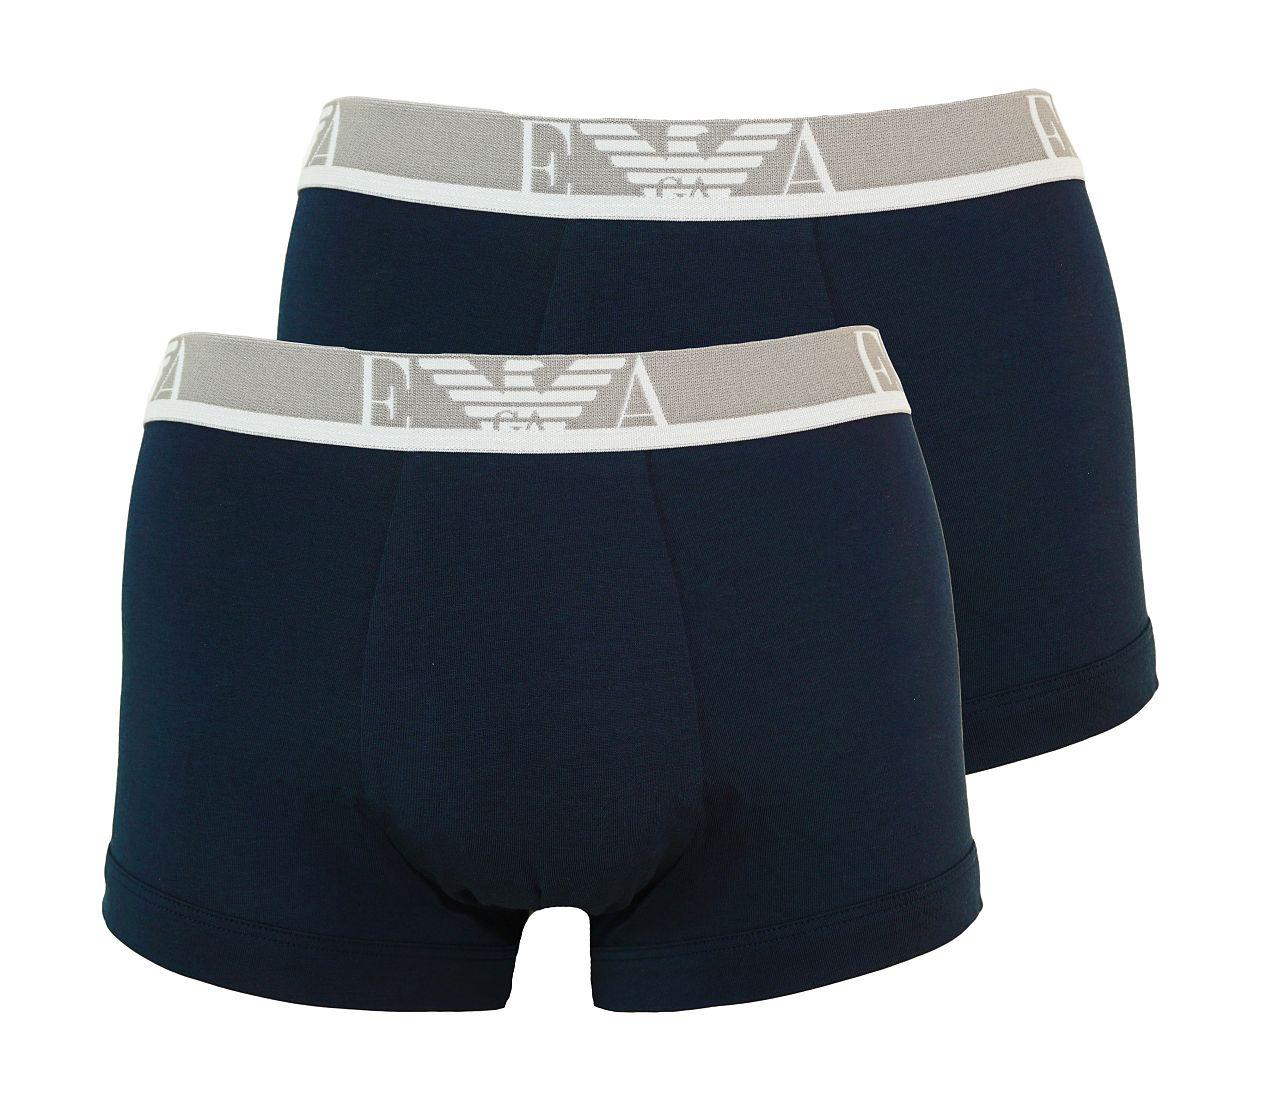 Emporio Armani 2er Pack Trunk Shorts MARINE/MARINE 111210 7P715 27435 WF17-EAT1